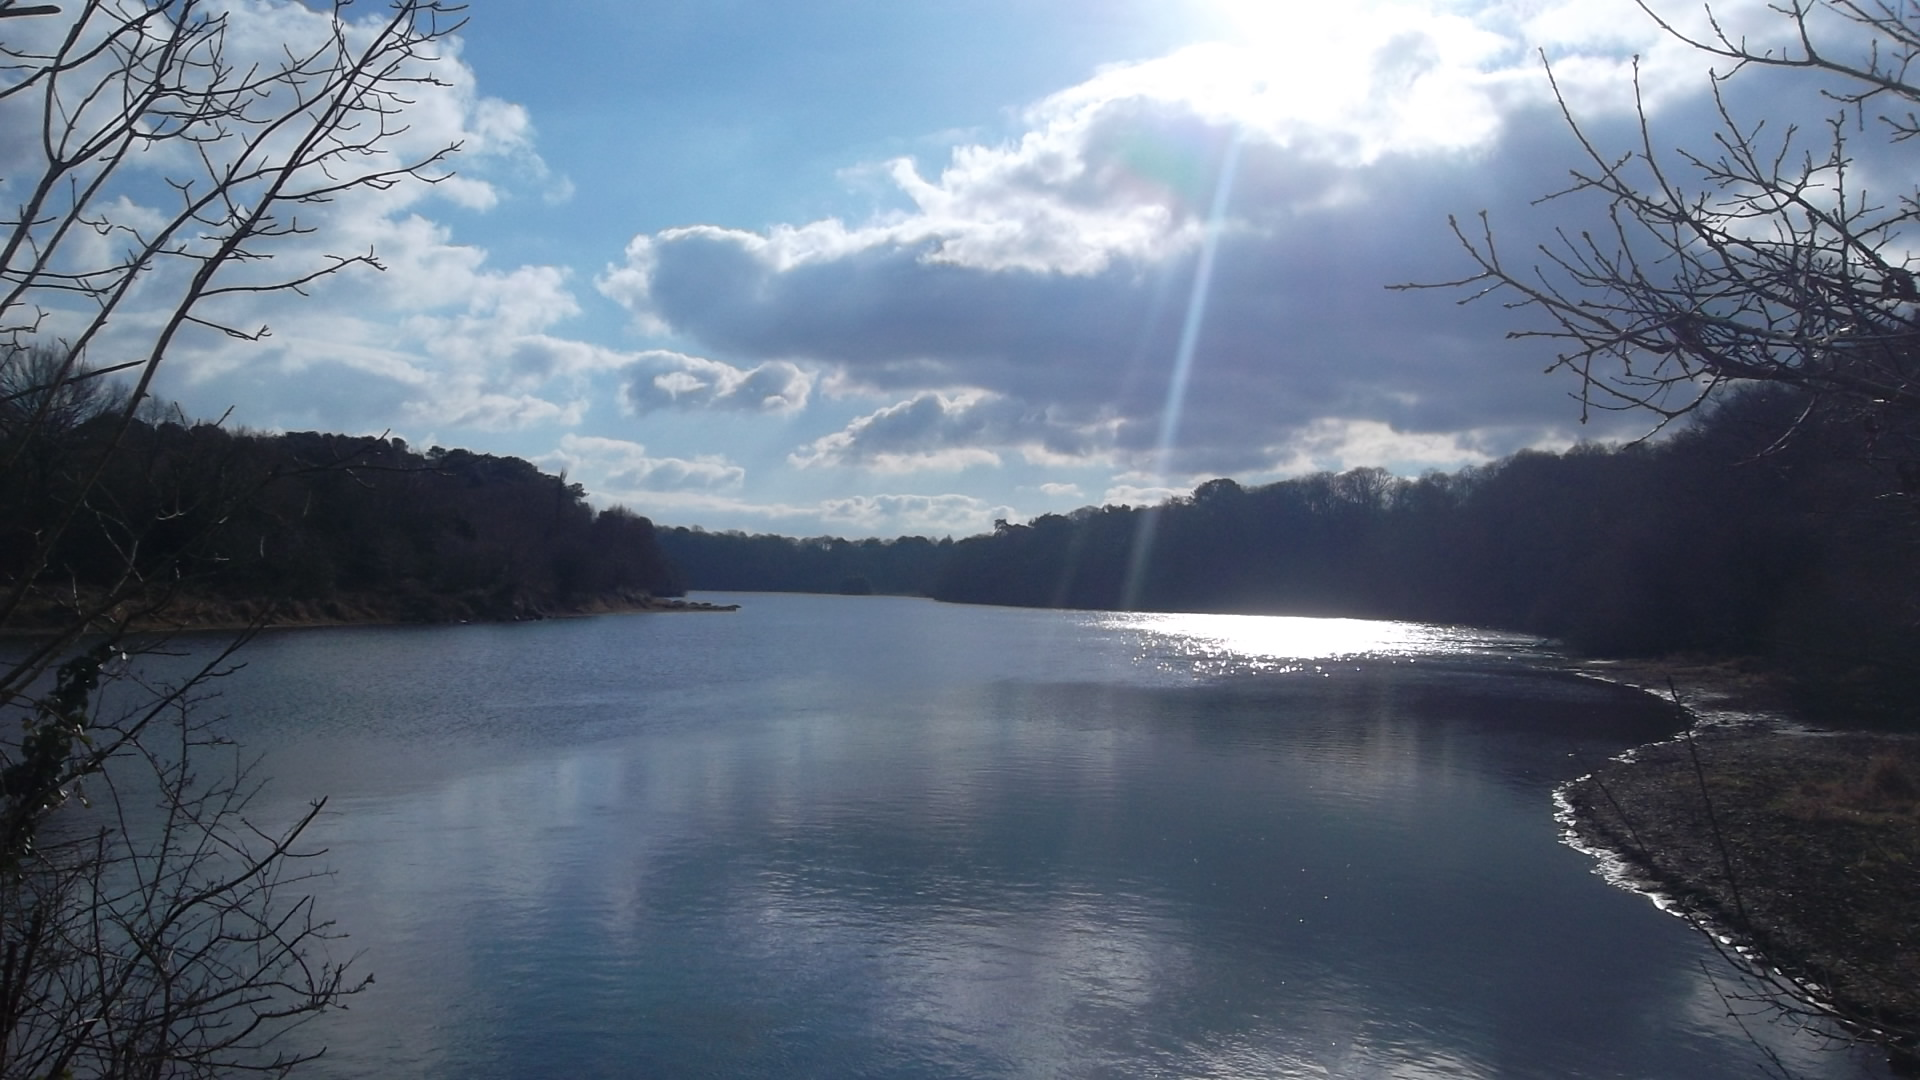 Brech loch river to auray river jan12